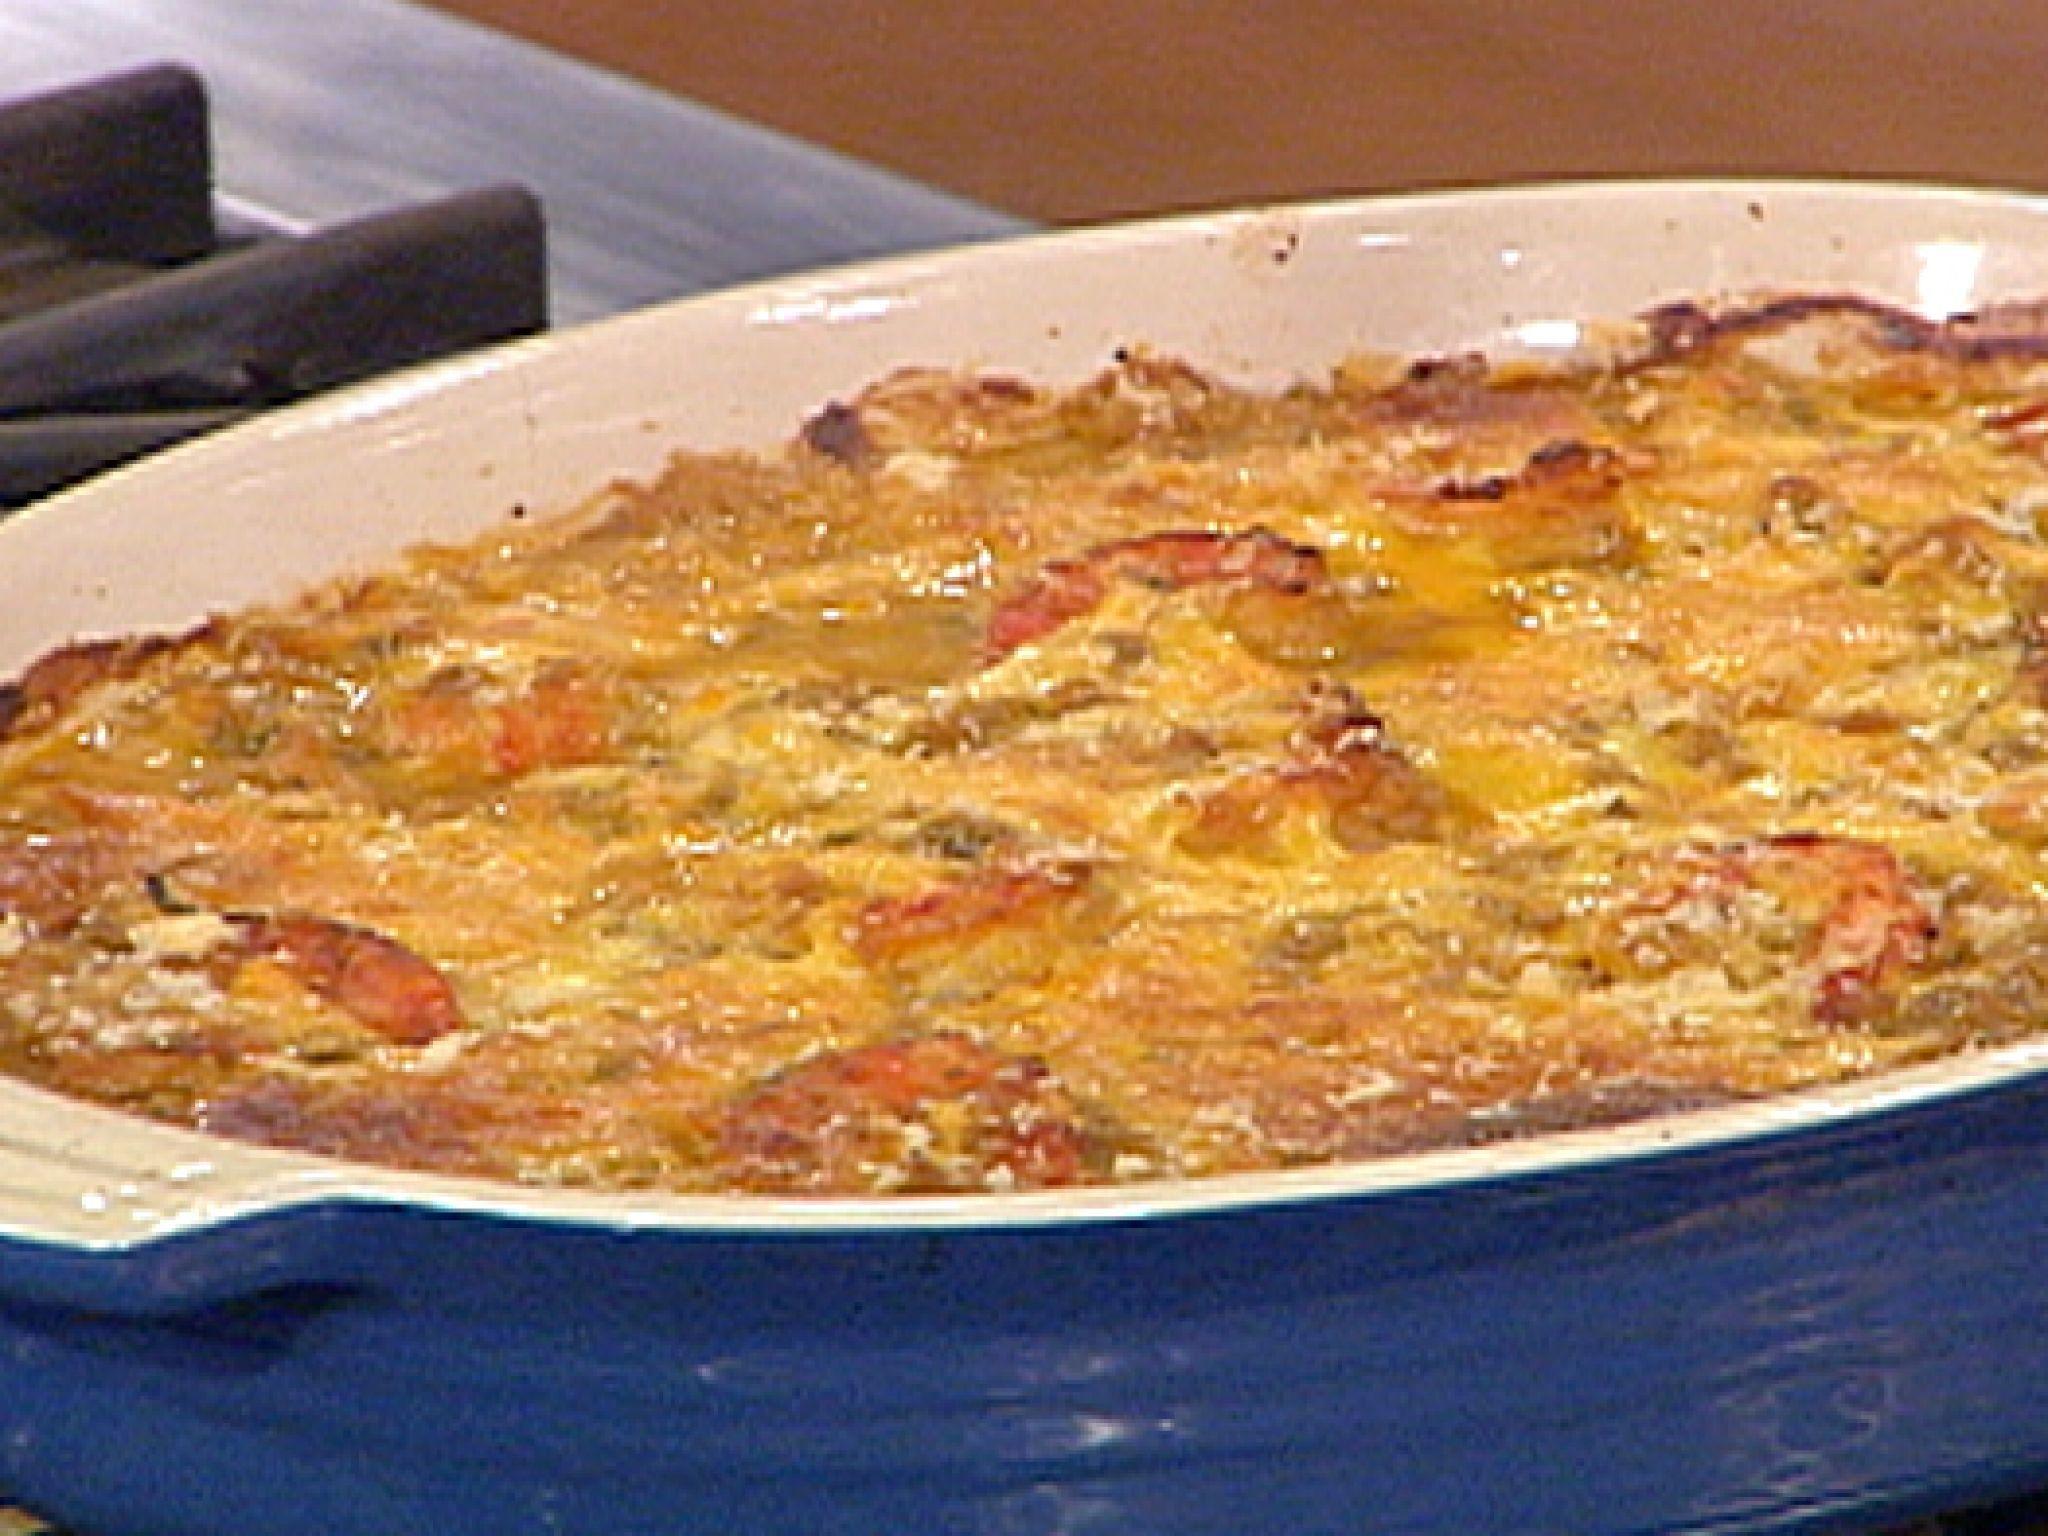 Shrimp and mirliton casserole recipe casserole recipes and food forumfinder Choice Image